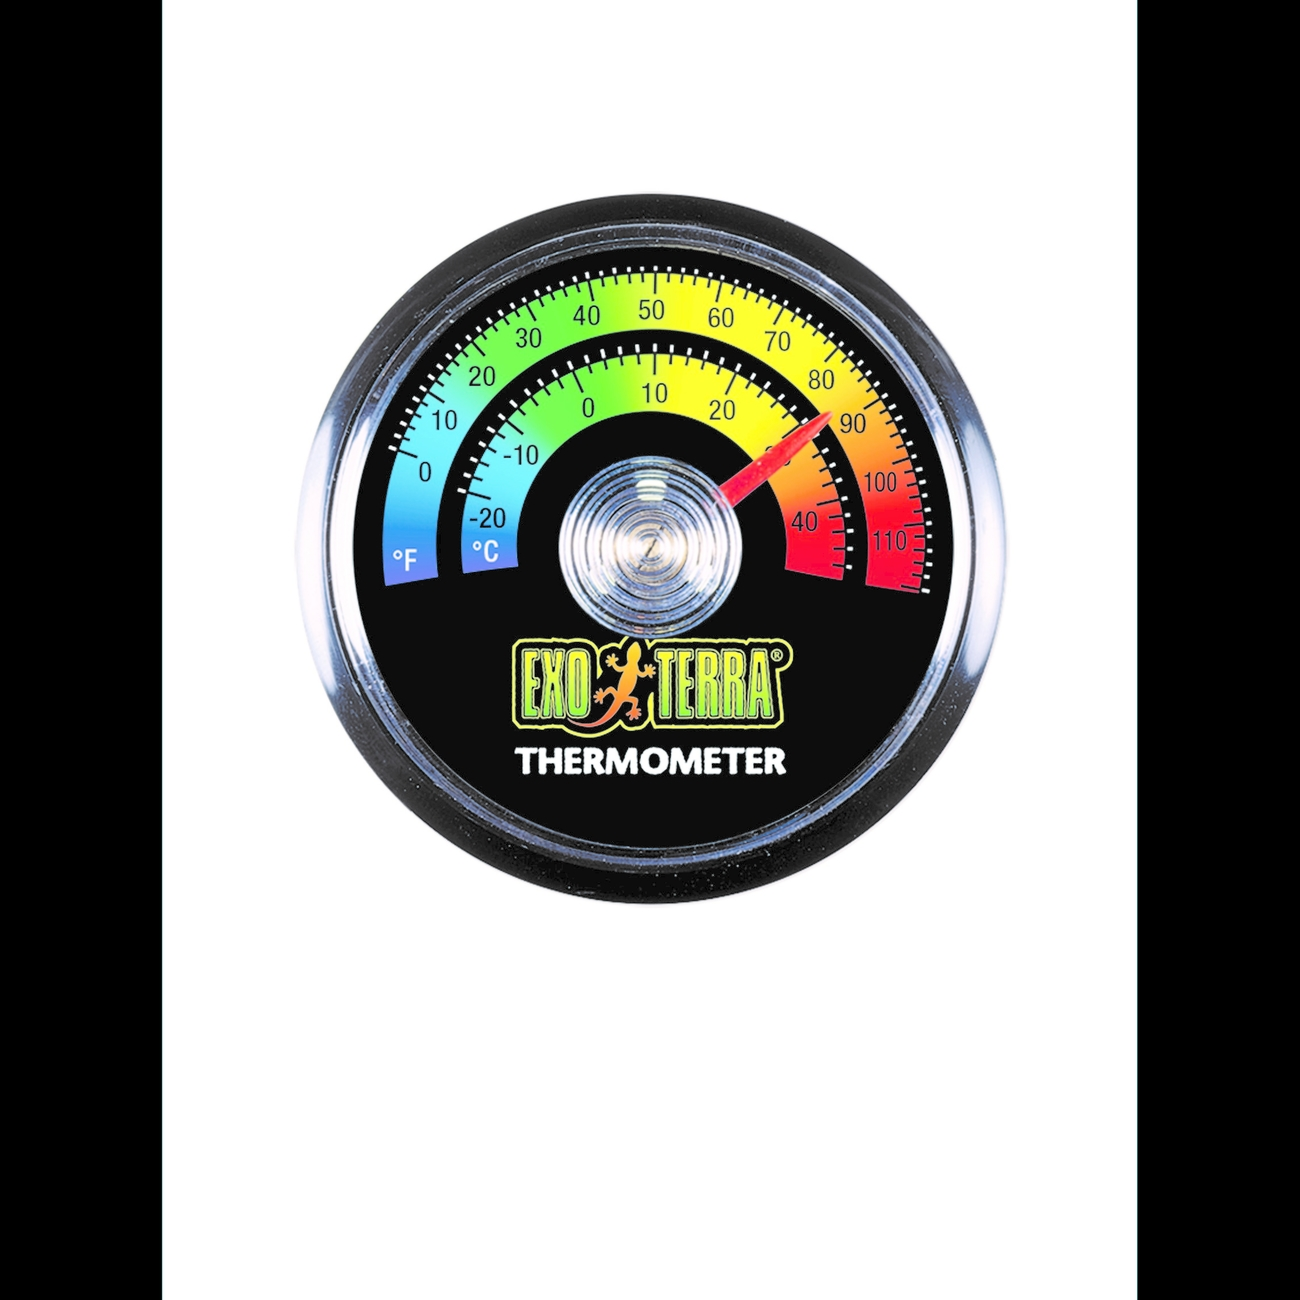 Exo Terra - Thermometer Rept-O-Meter, Bild 2